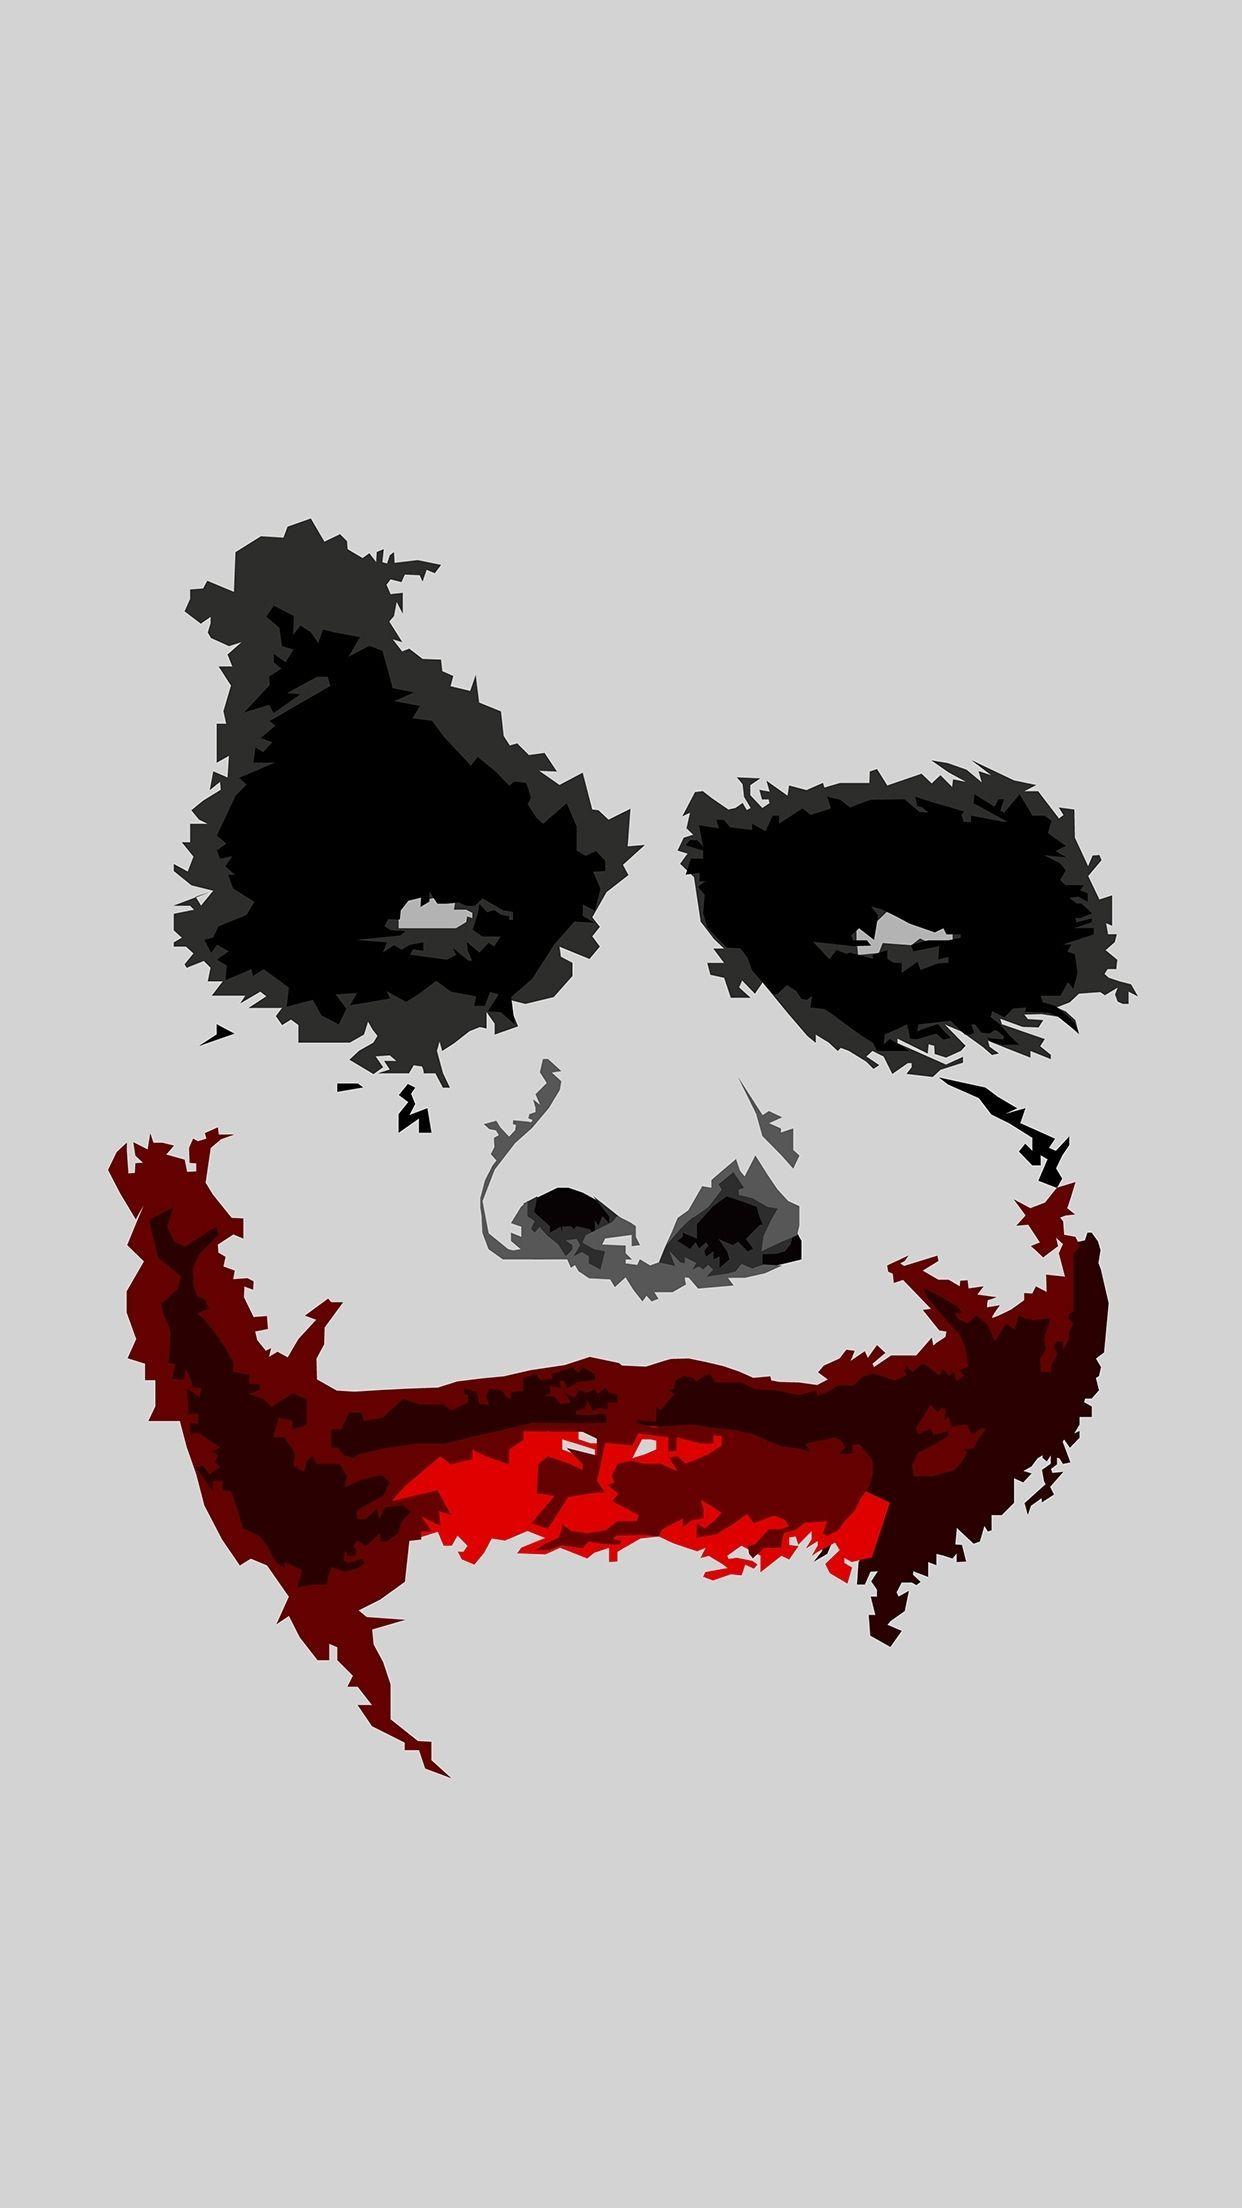 9562104952b23 The Joker Iphone Wallpaper Hd - Download New The Joker Iphone ...